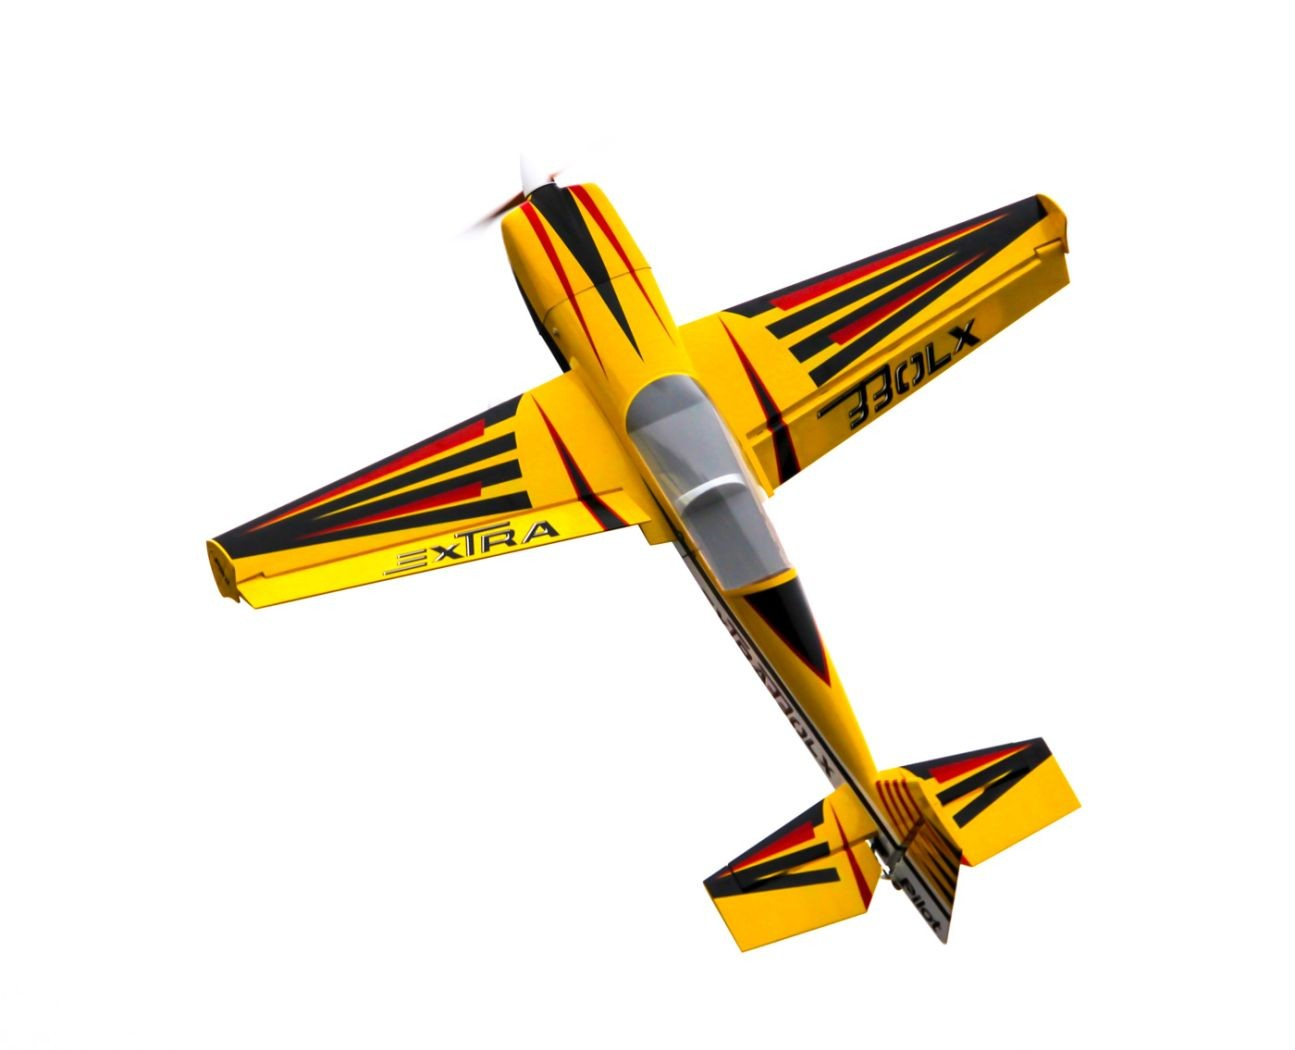 Extra 330lx 92 Quot 2 34m Pilot Rc